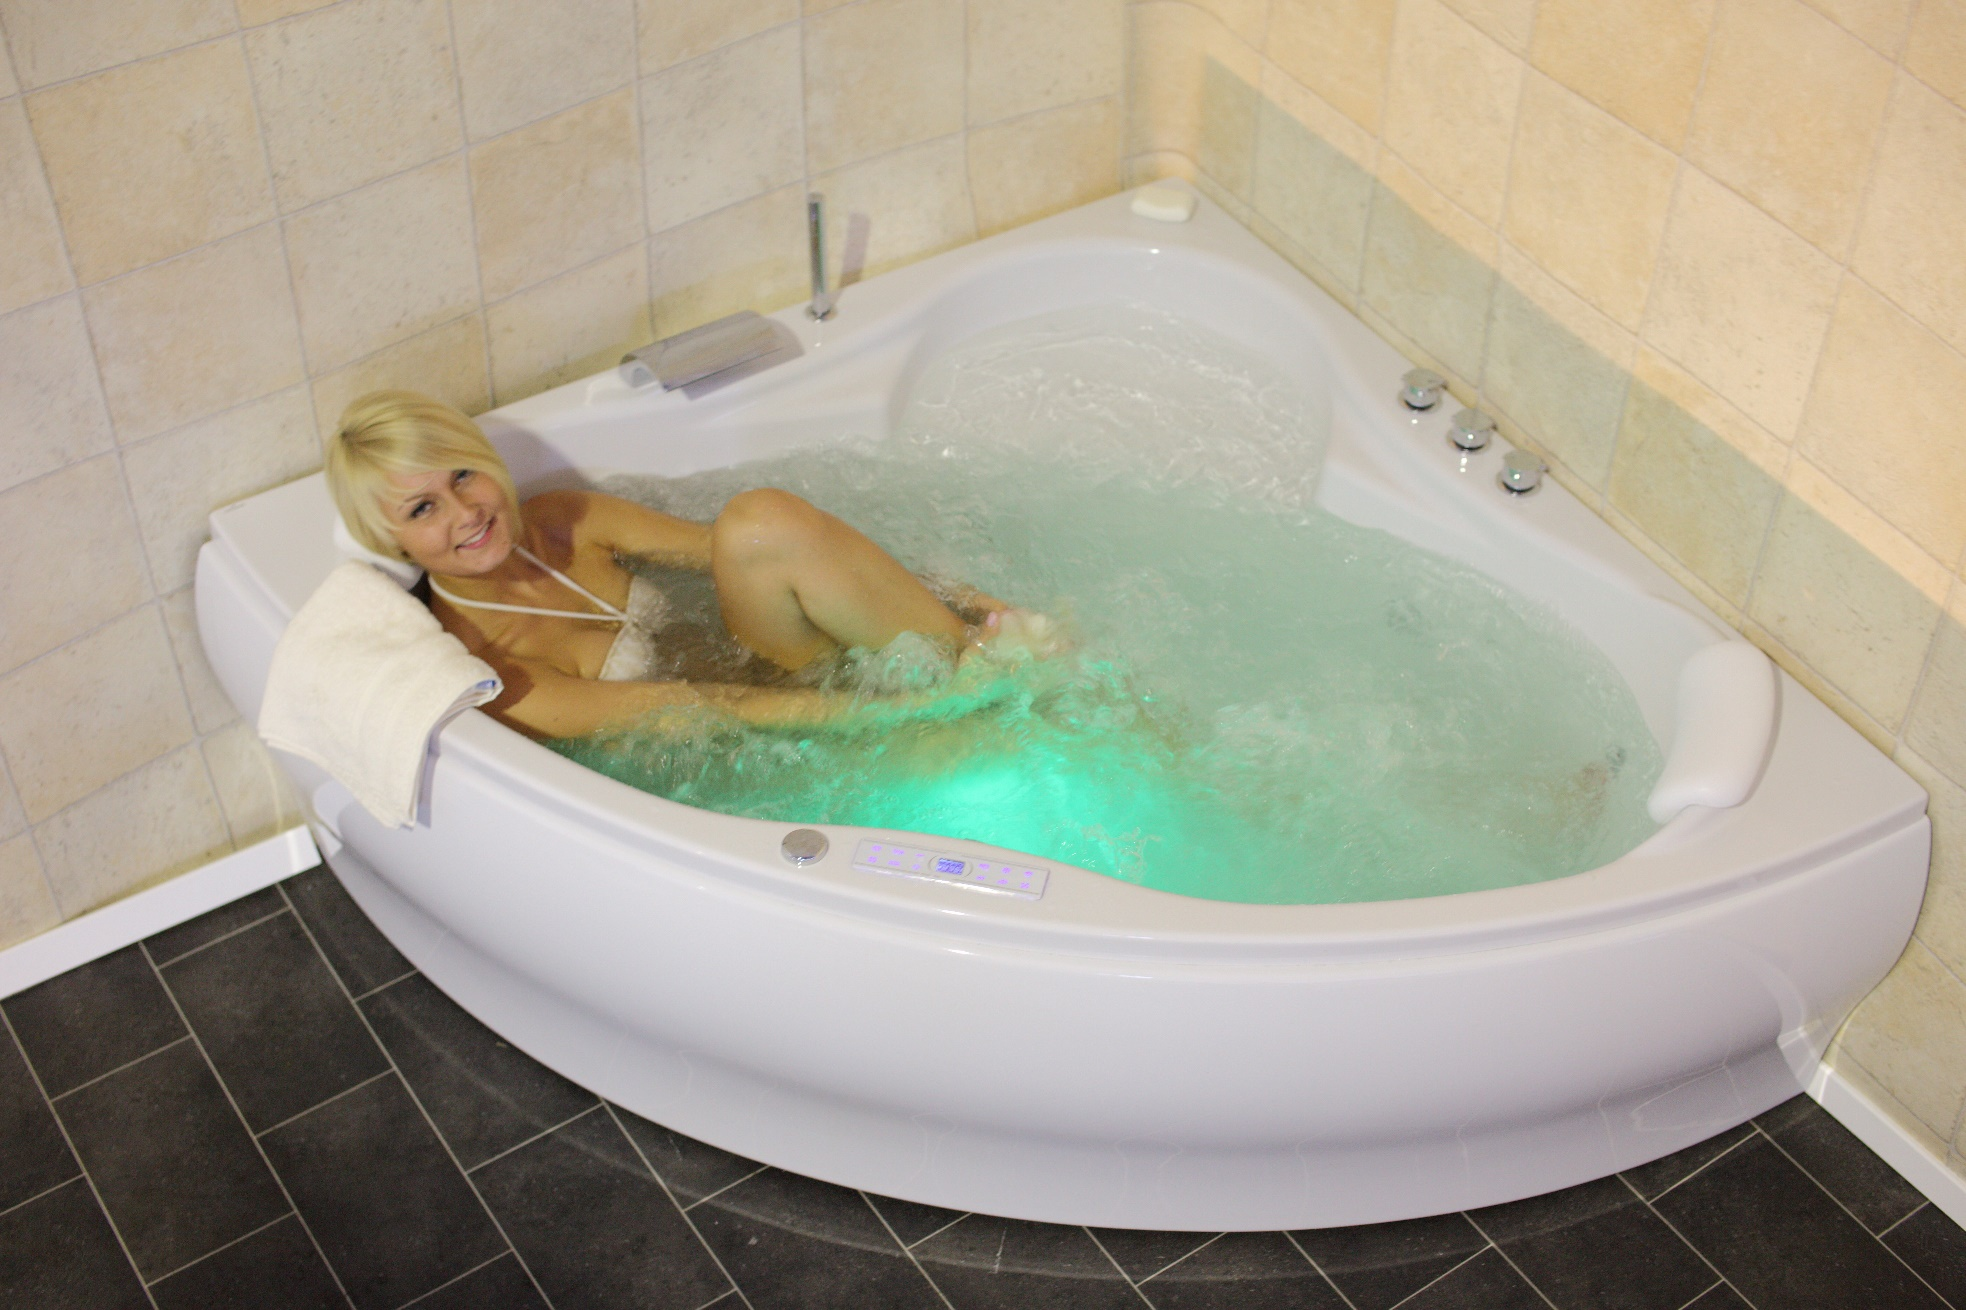 Jacuzzi tub 24 jets heating ozone led tv radio jacuzzi spa for Whirlpool einlage badewanne